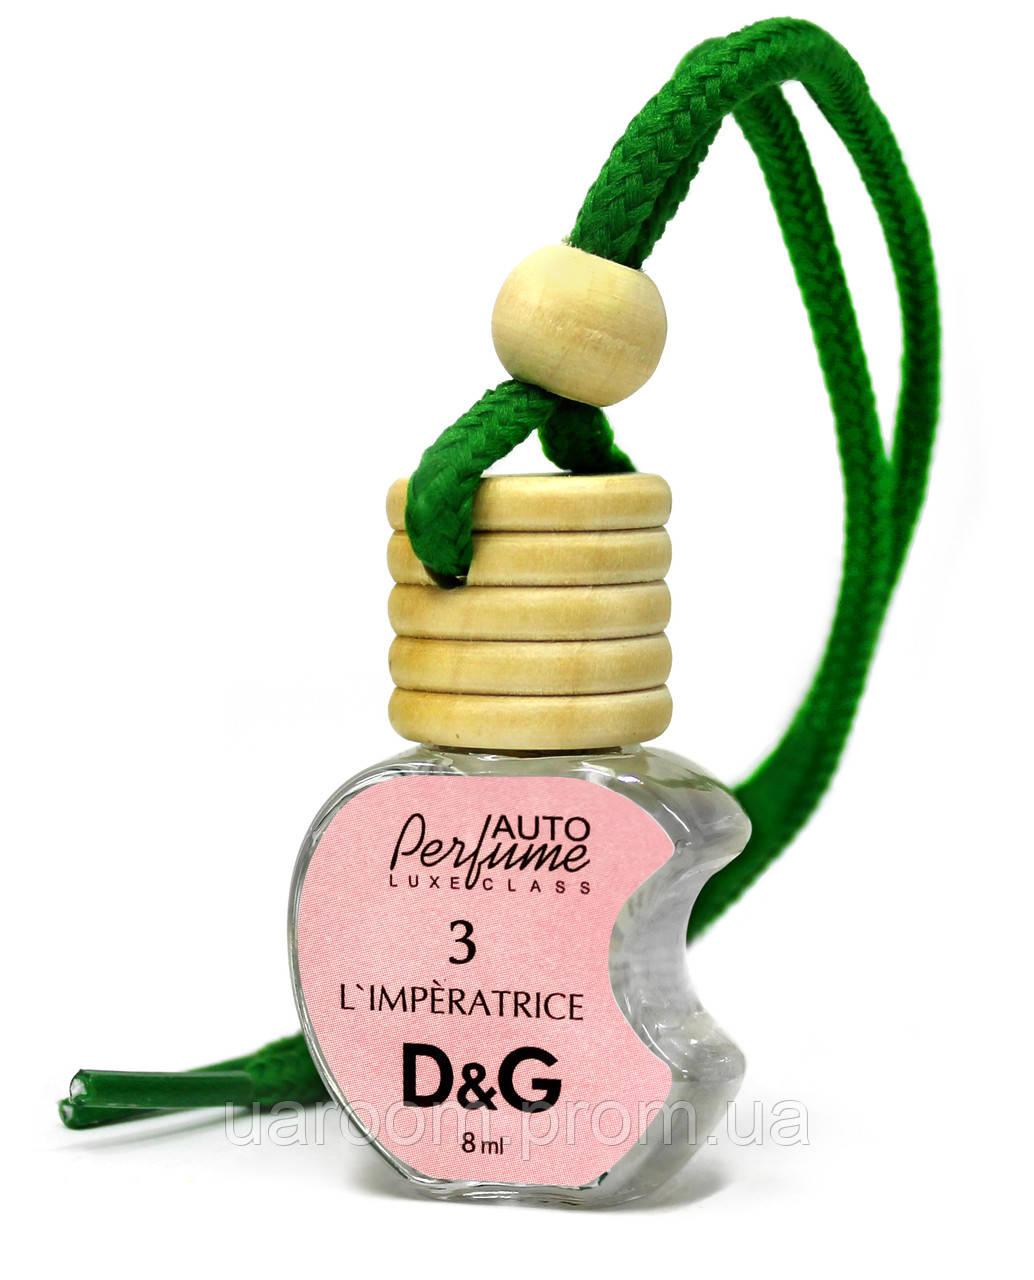 Ароматизатор LUXE CLASS Dolce&Gabbana 3 L ' imperatrice